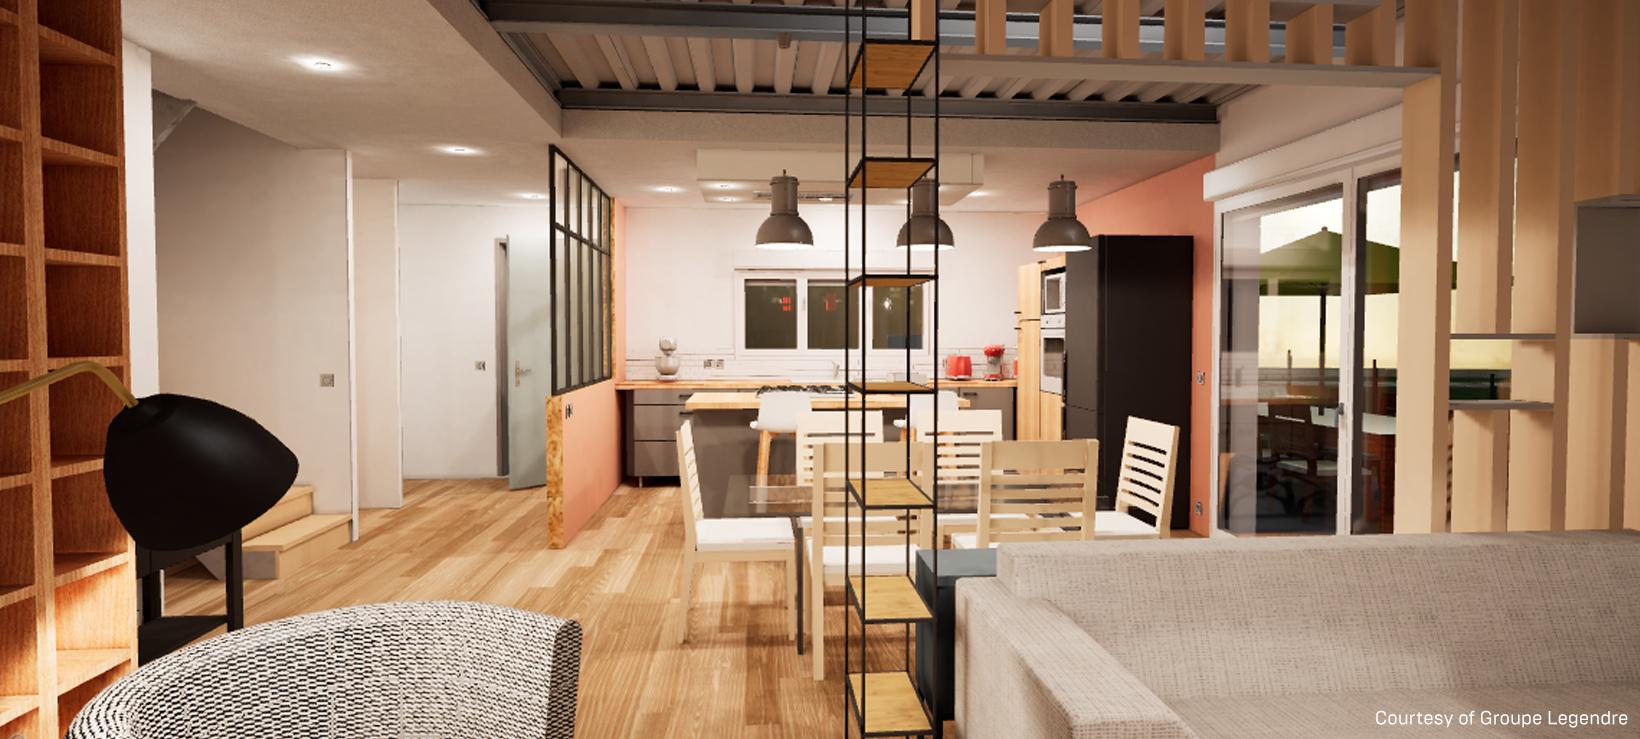 Nouveau architectural visualization: VR walkthroughs with